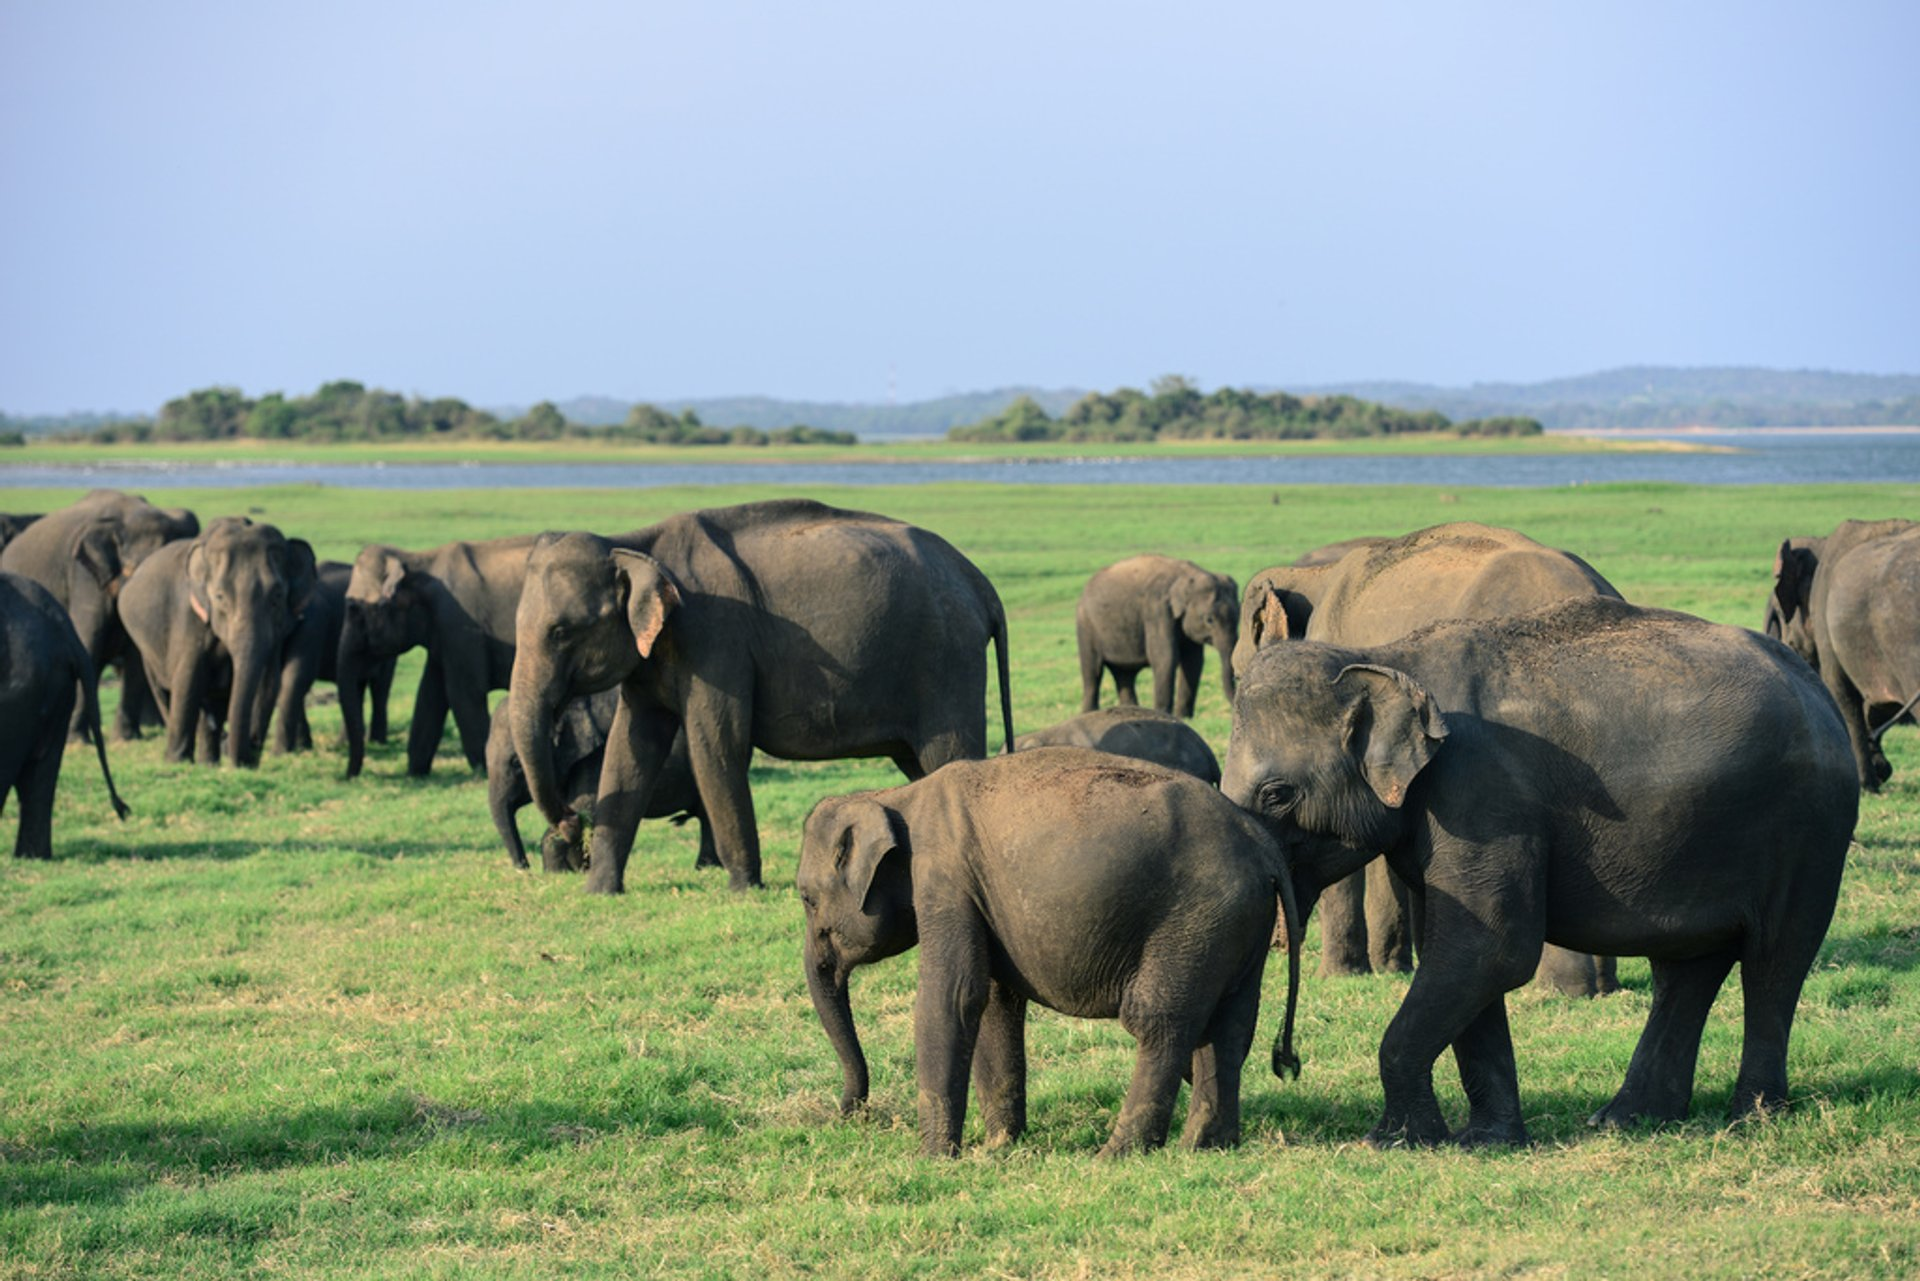 Elephant Gathering in Sri Lanka 2020 - Best Time